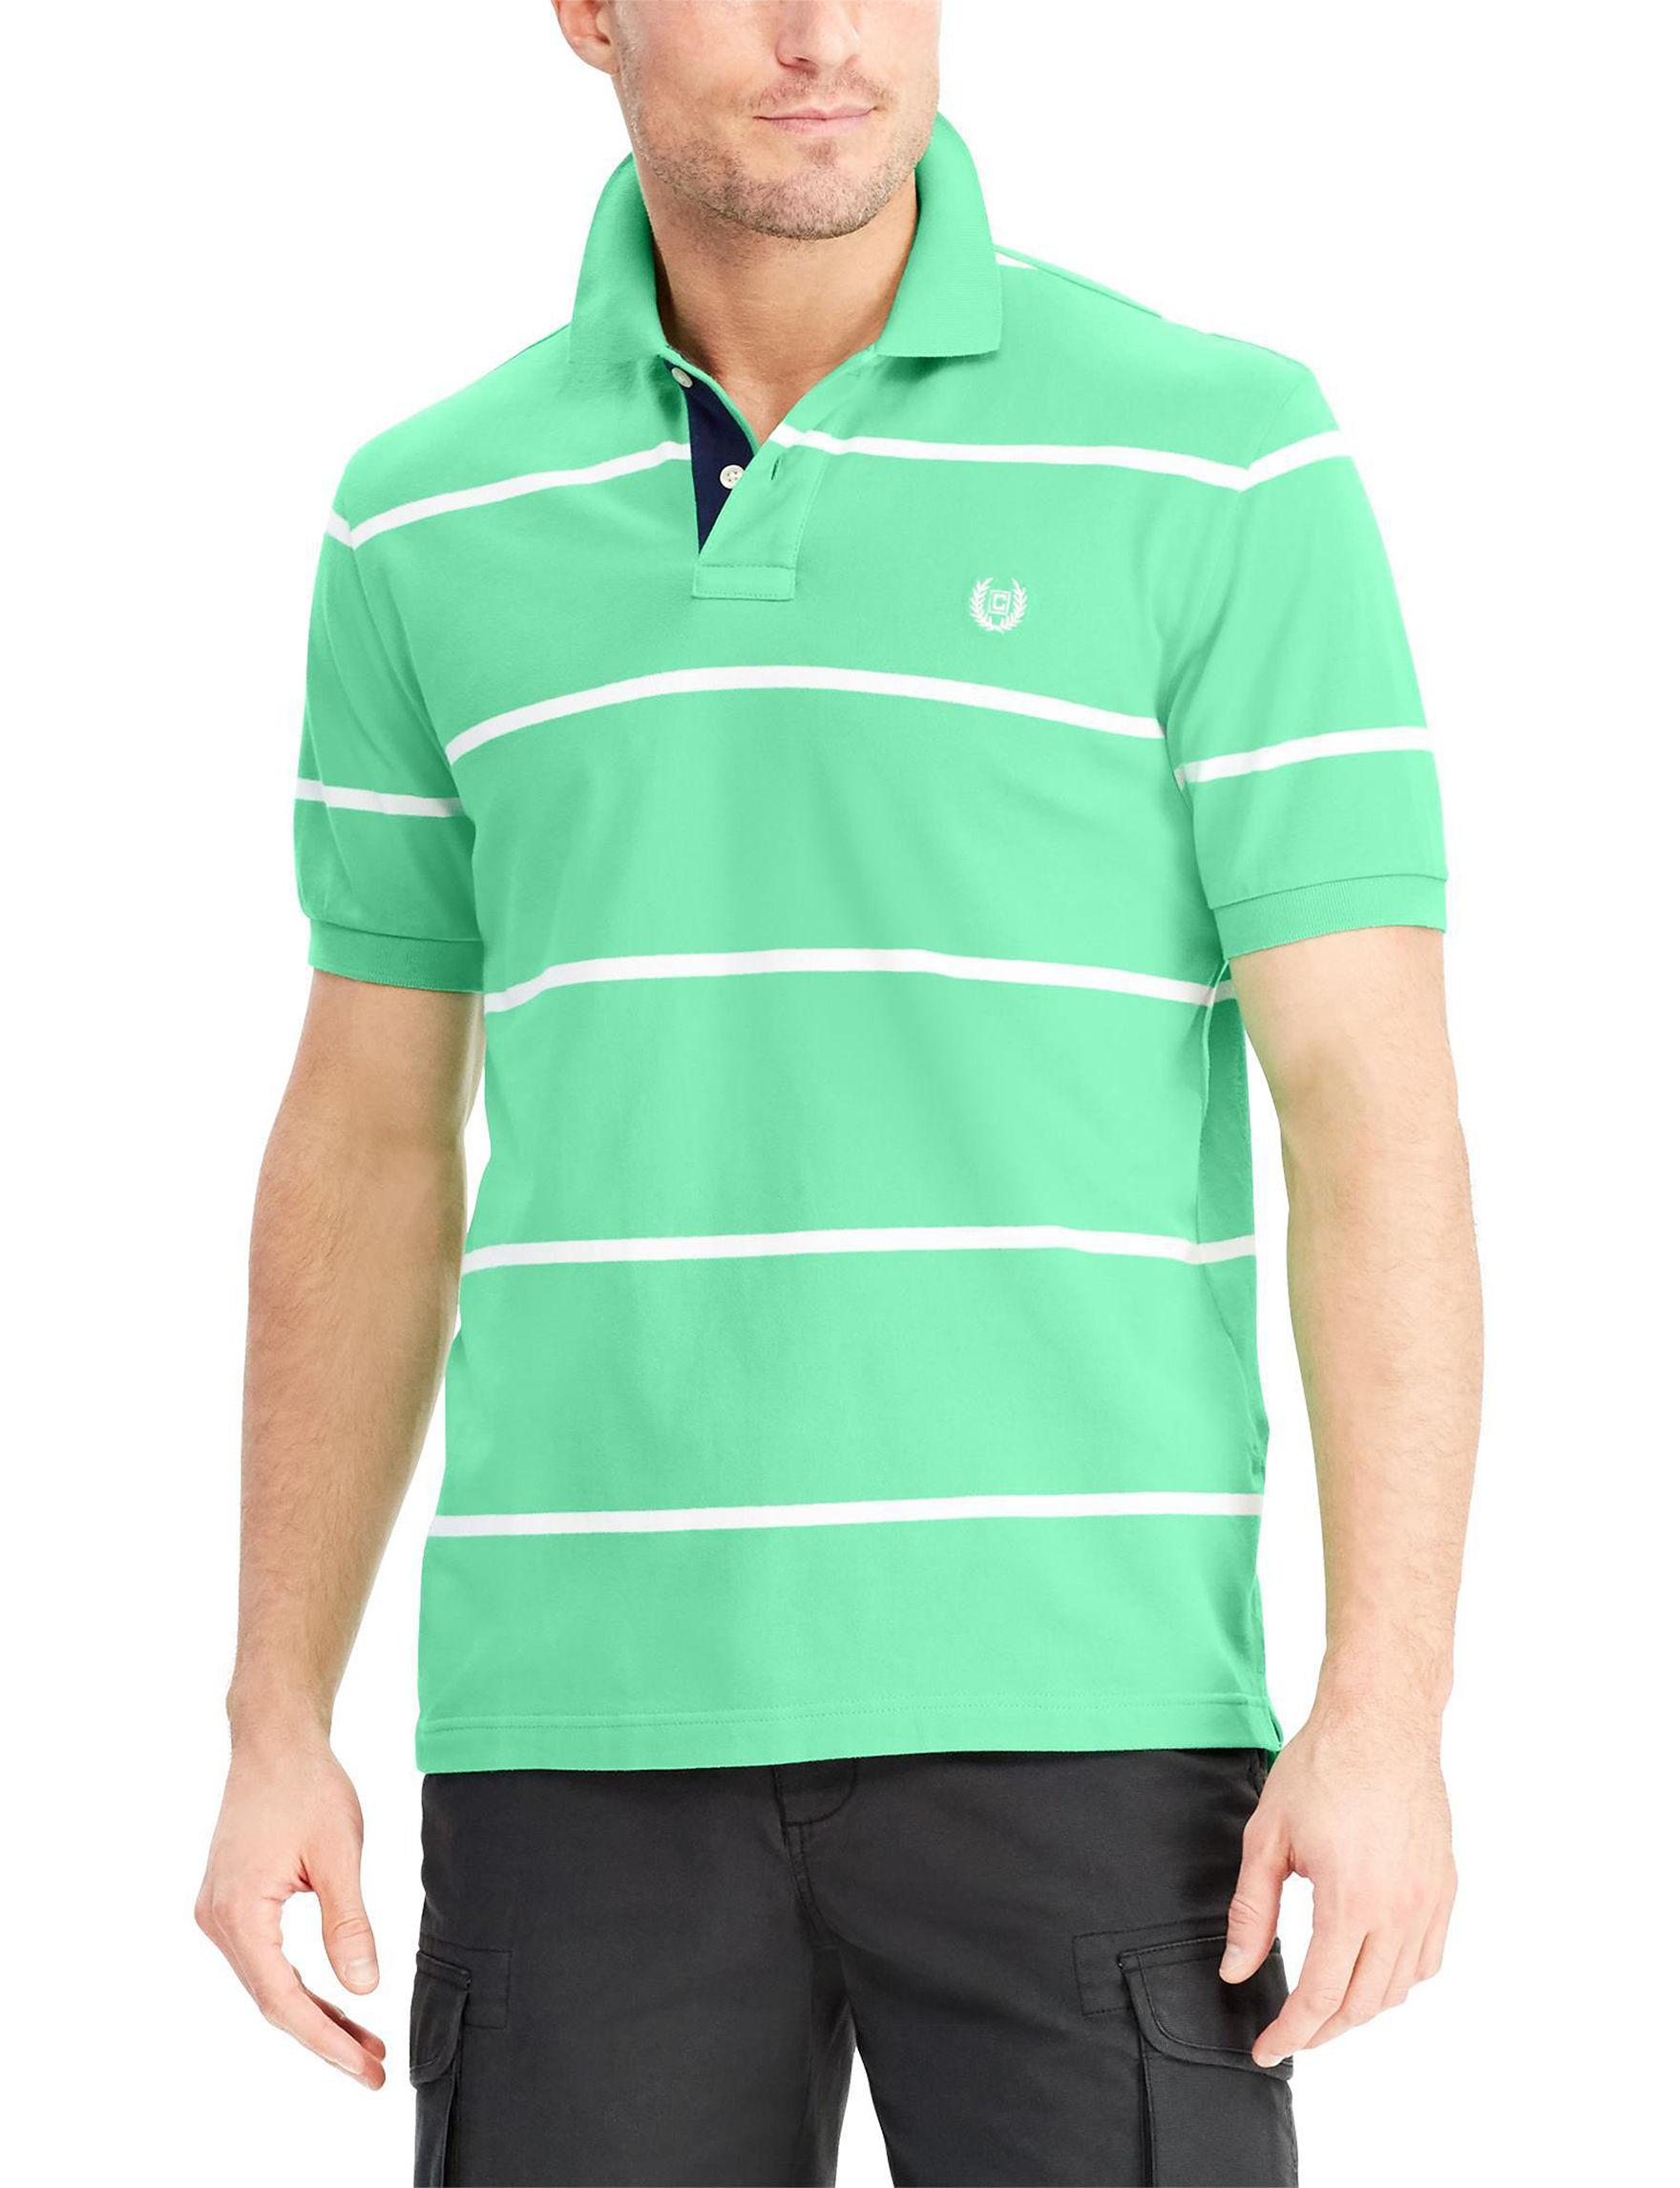 Chaps Green / White Polos